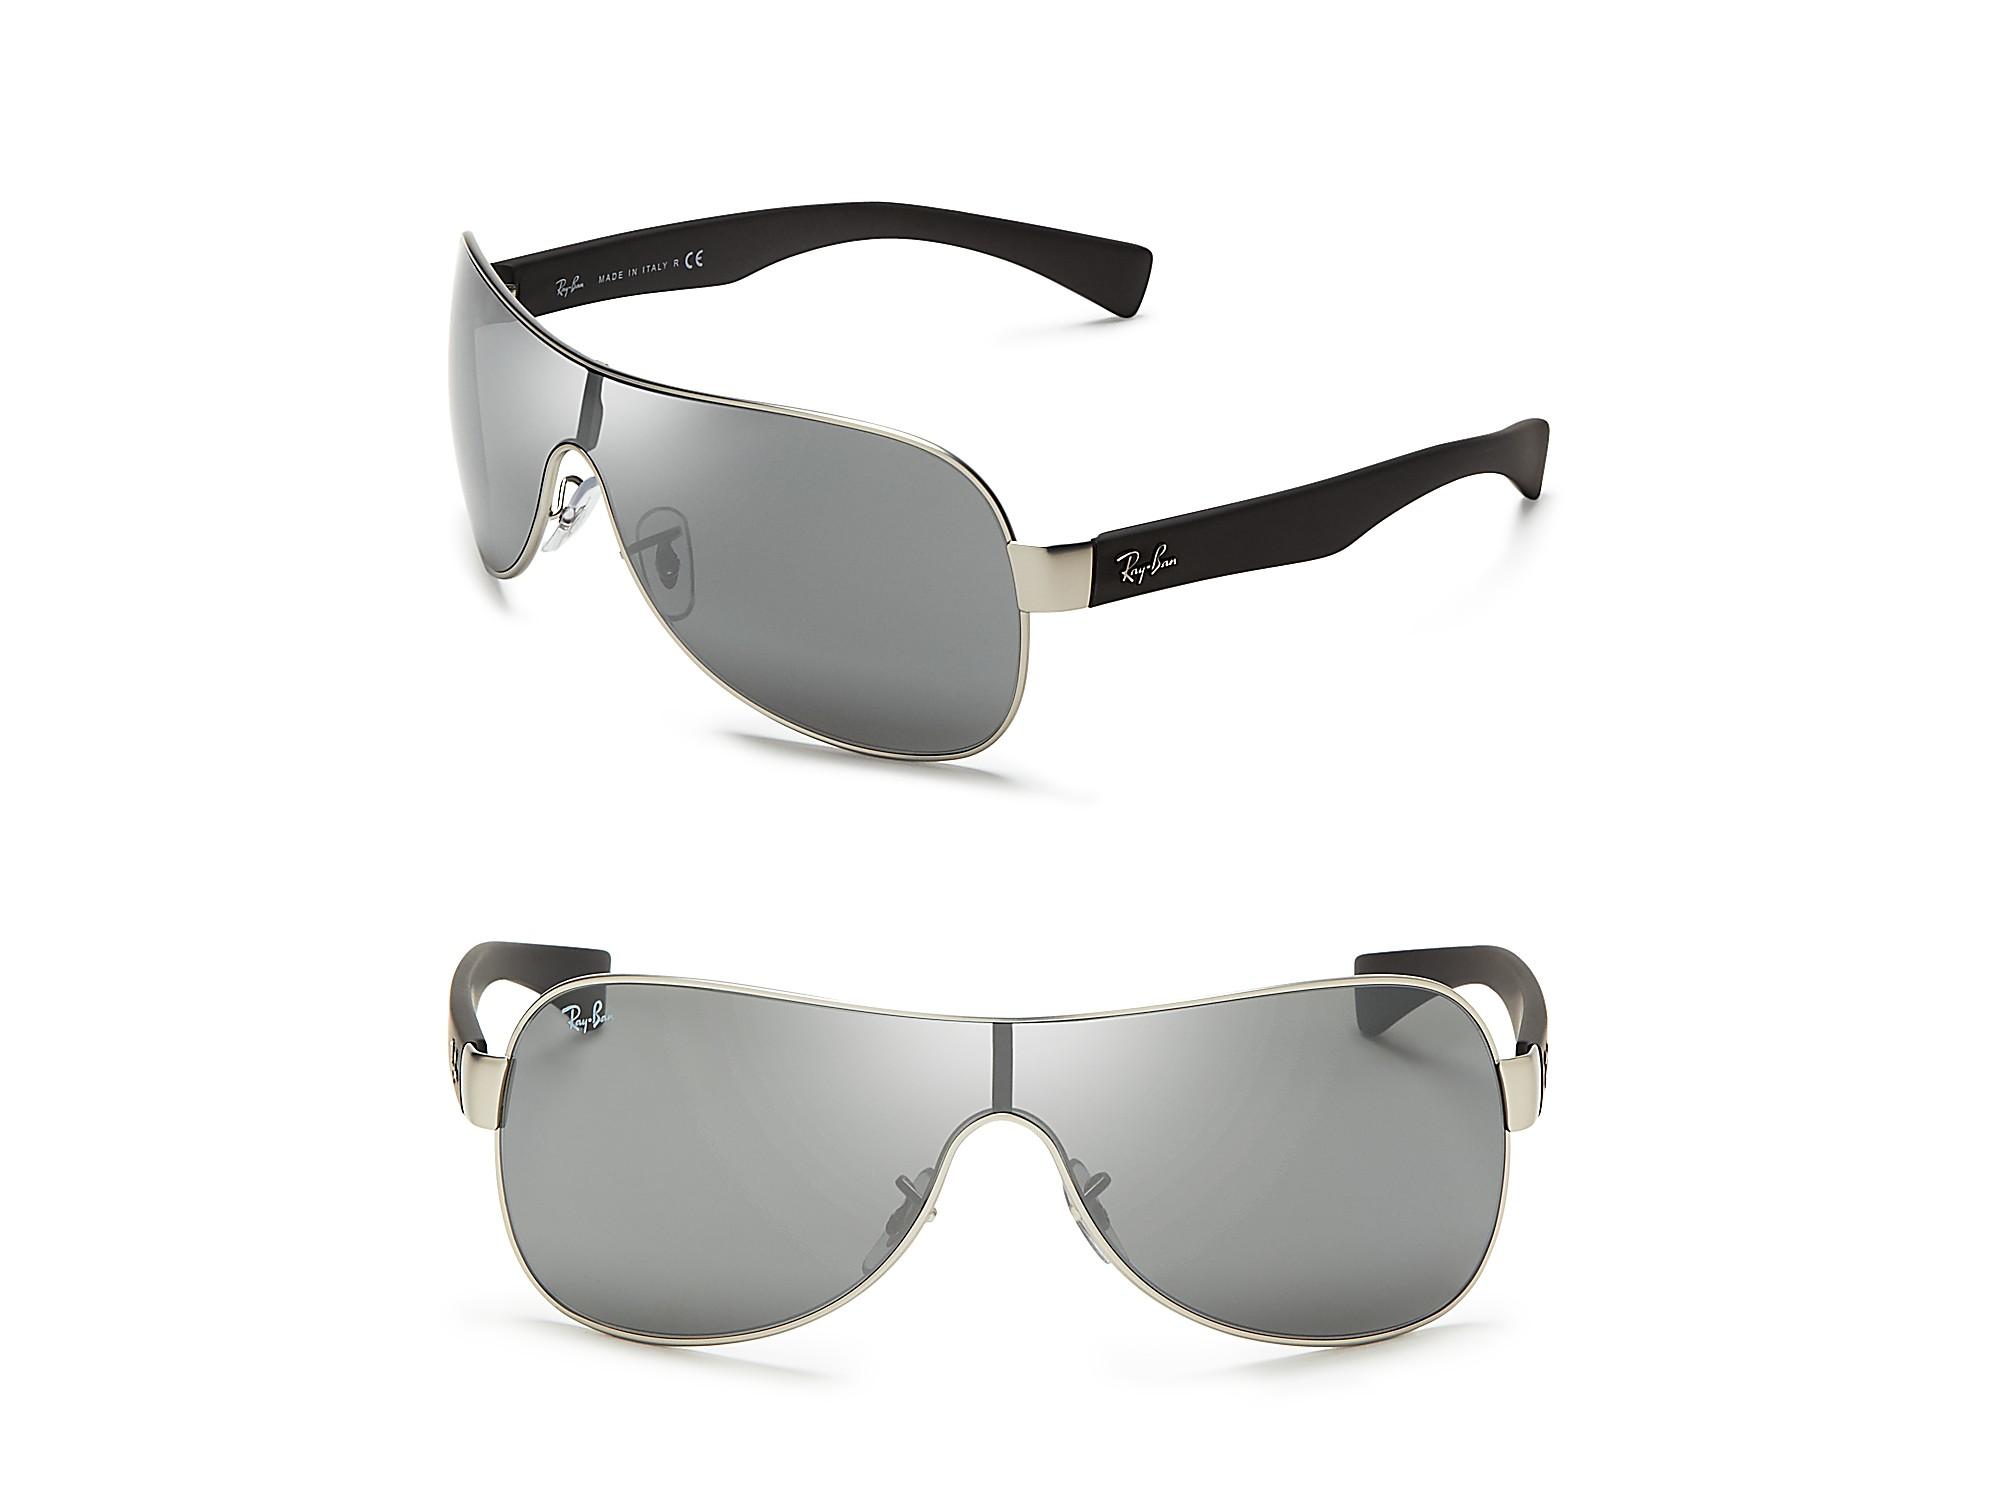 08acc2edc7 Shield Sunglasses Ray Ban « Heritage Malta